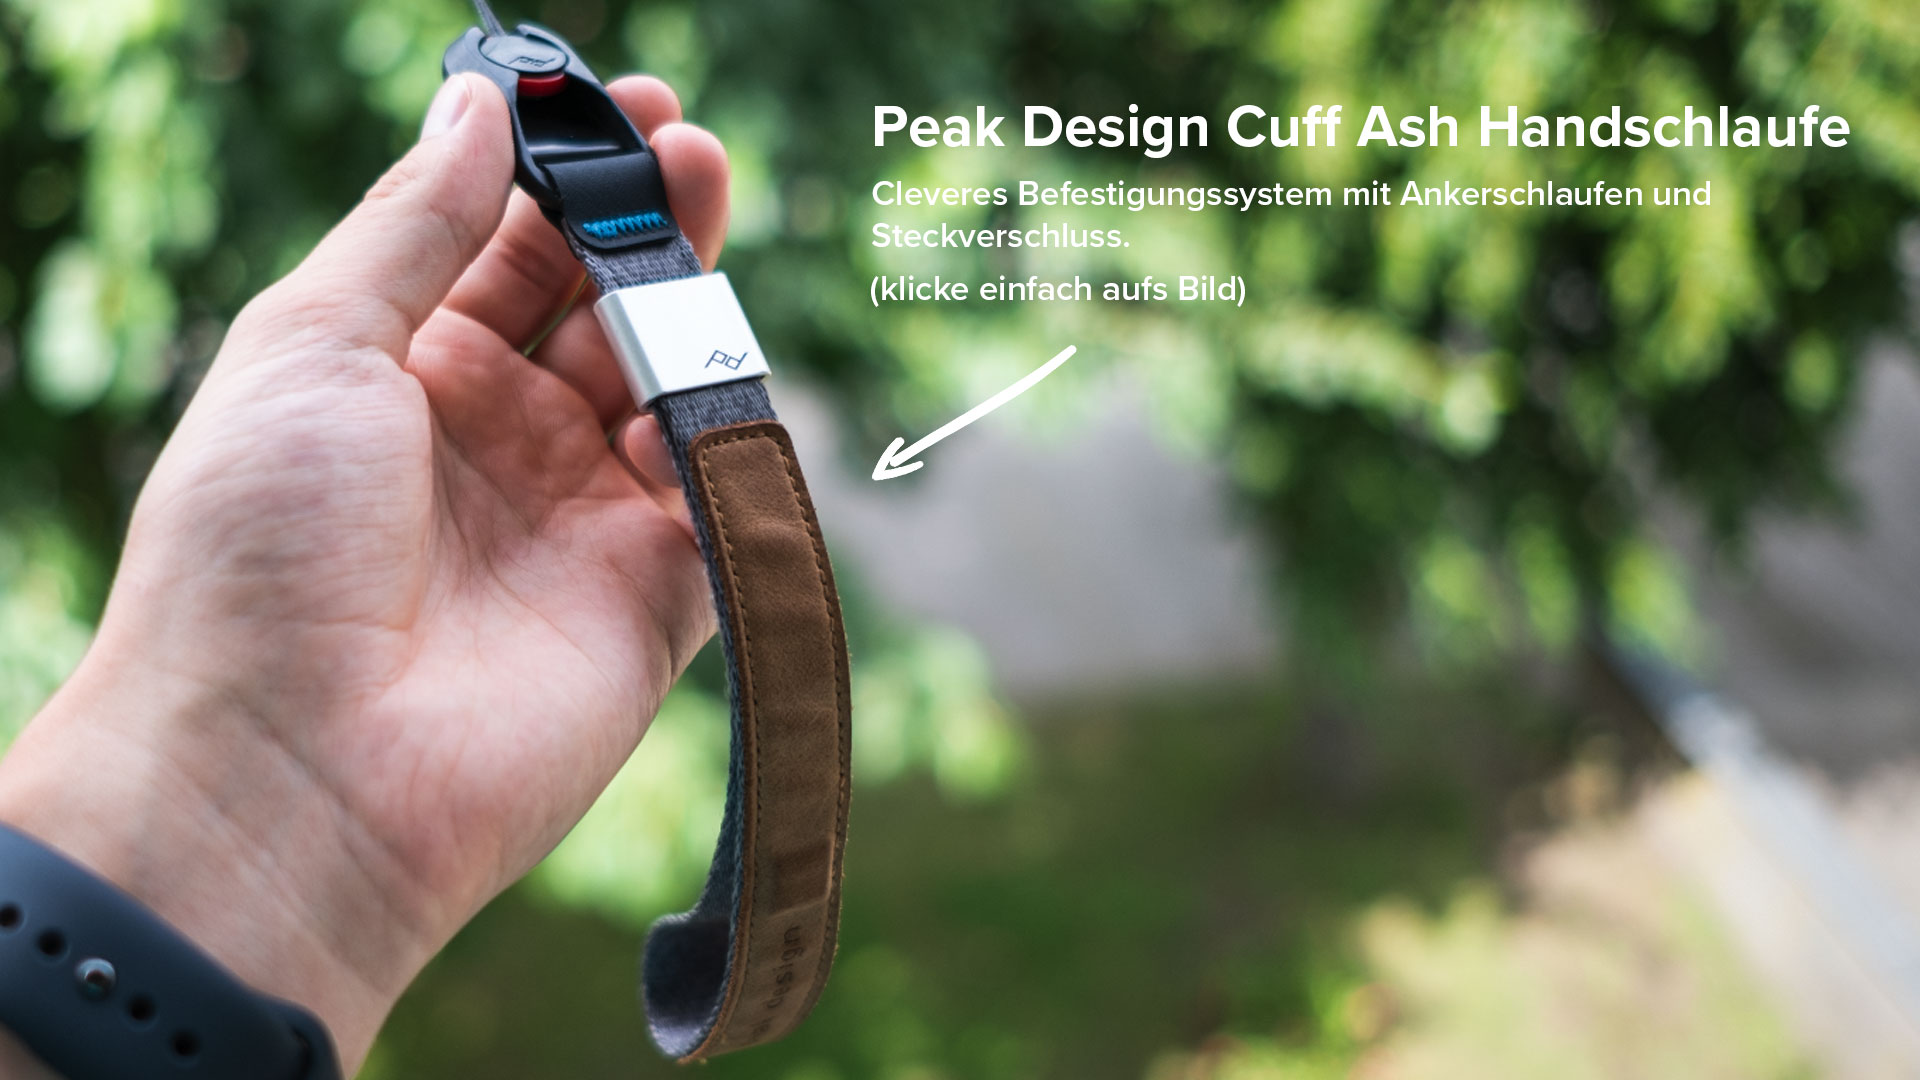 Peak Design Cuff Ash Handschlaufe